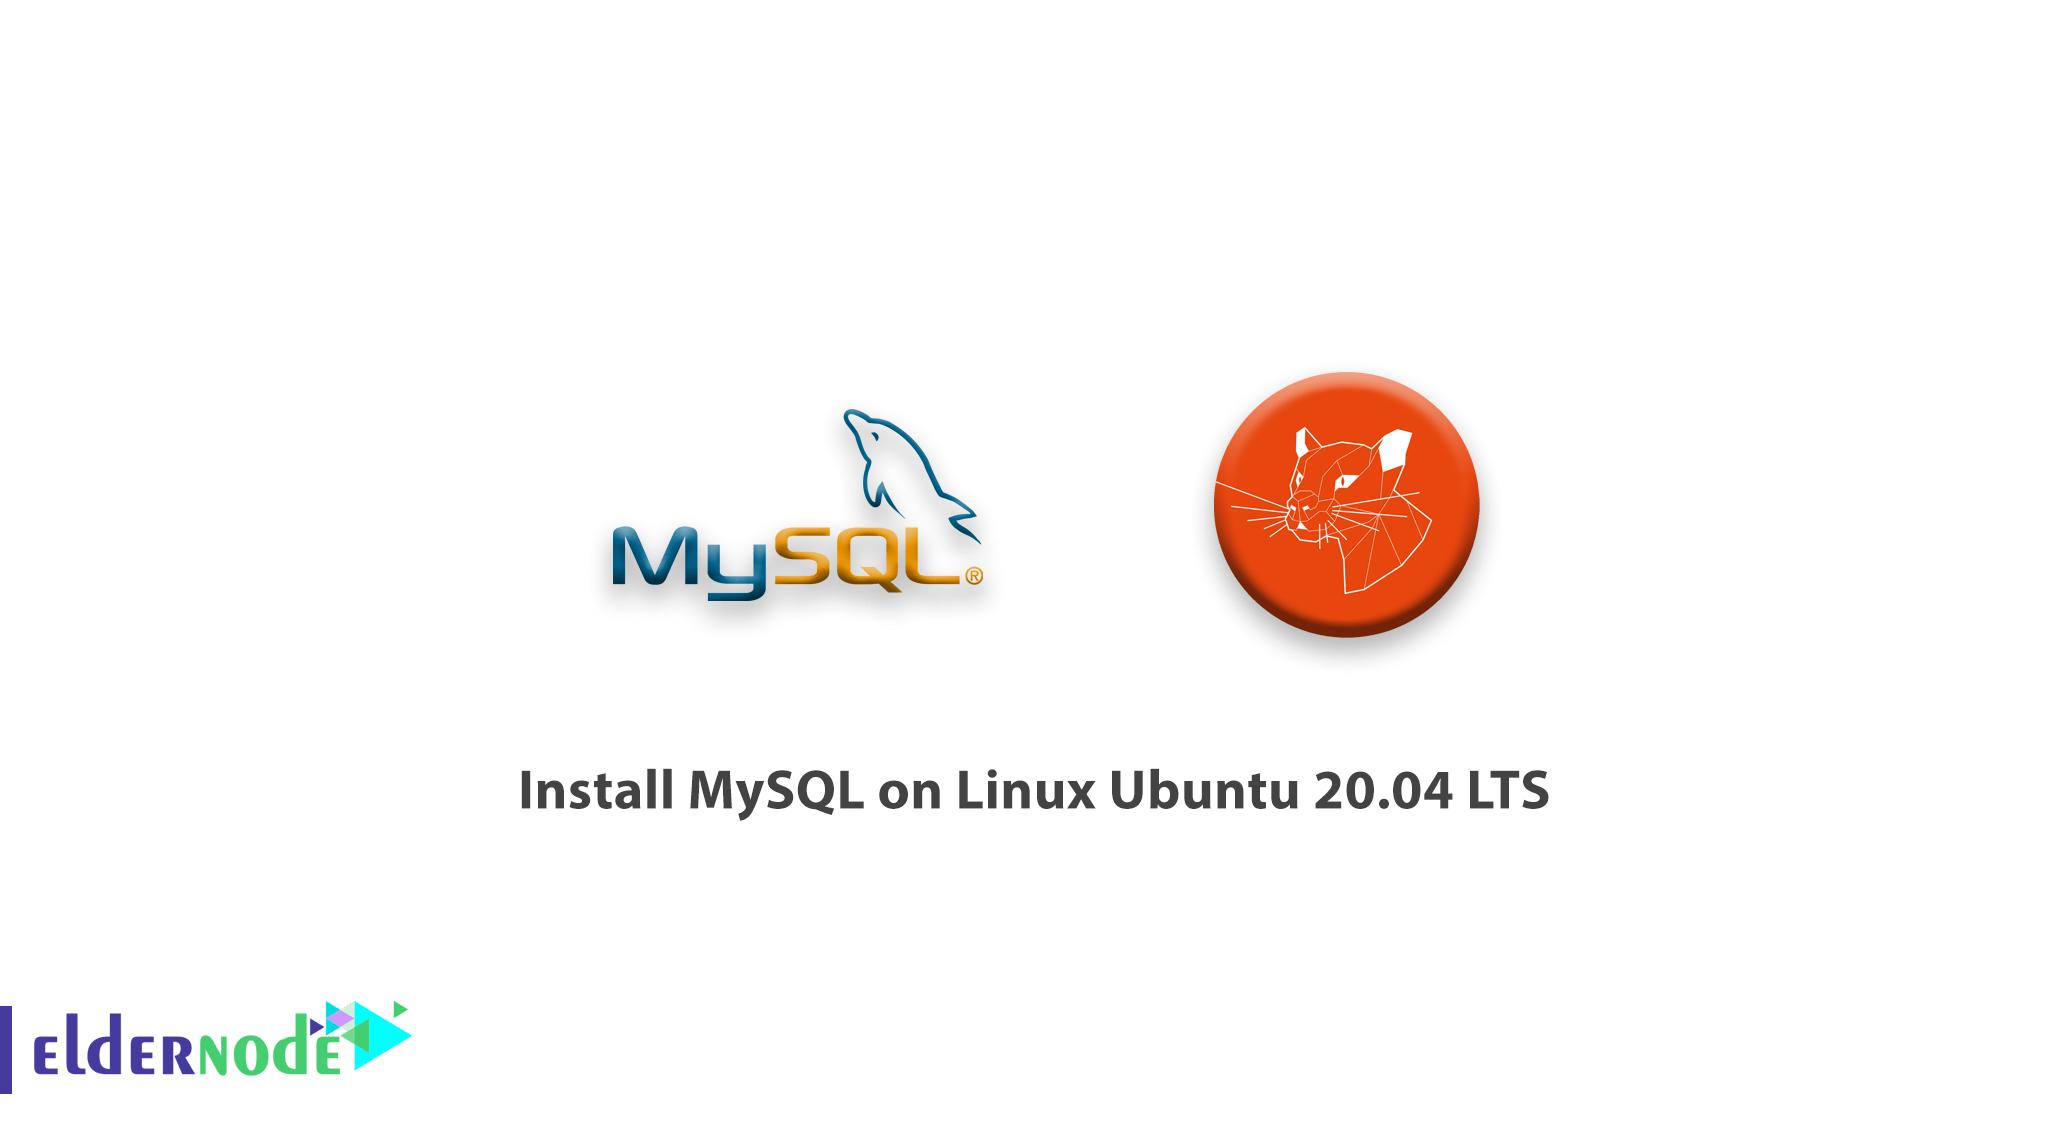 How to Install MySQL on Linux Ubuntu 20.04 LTS